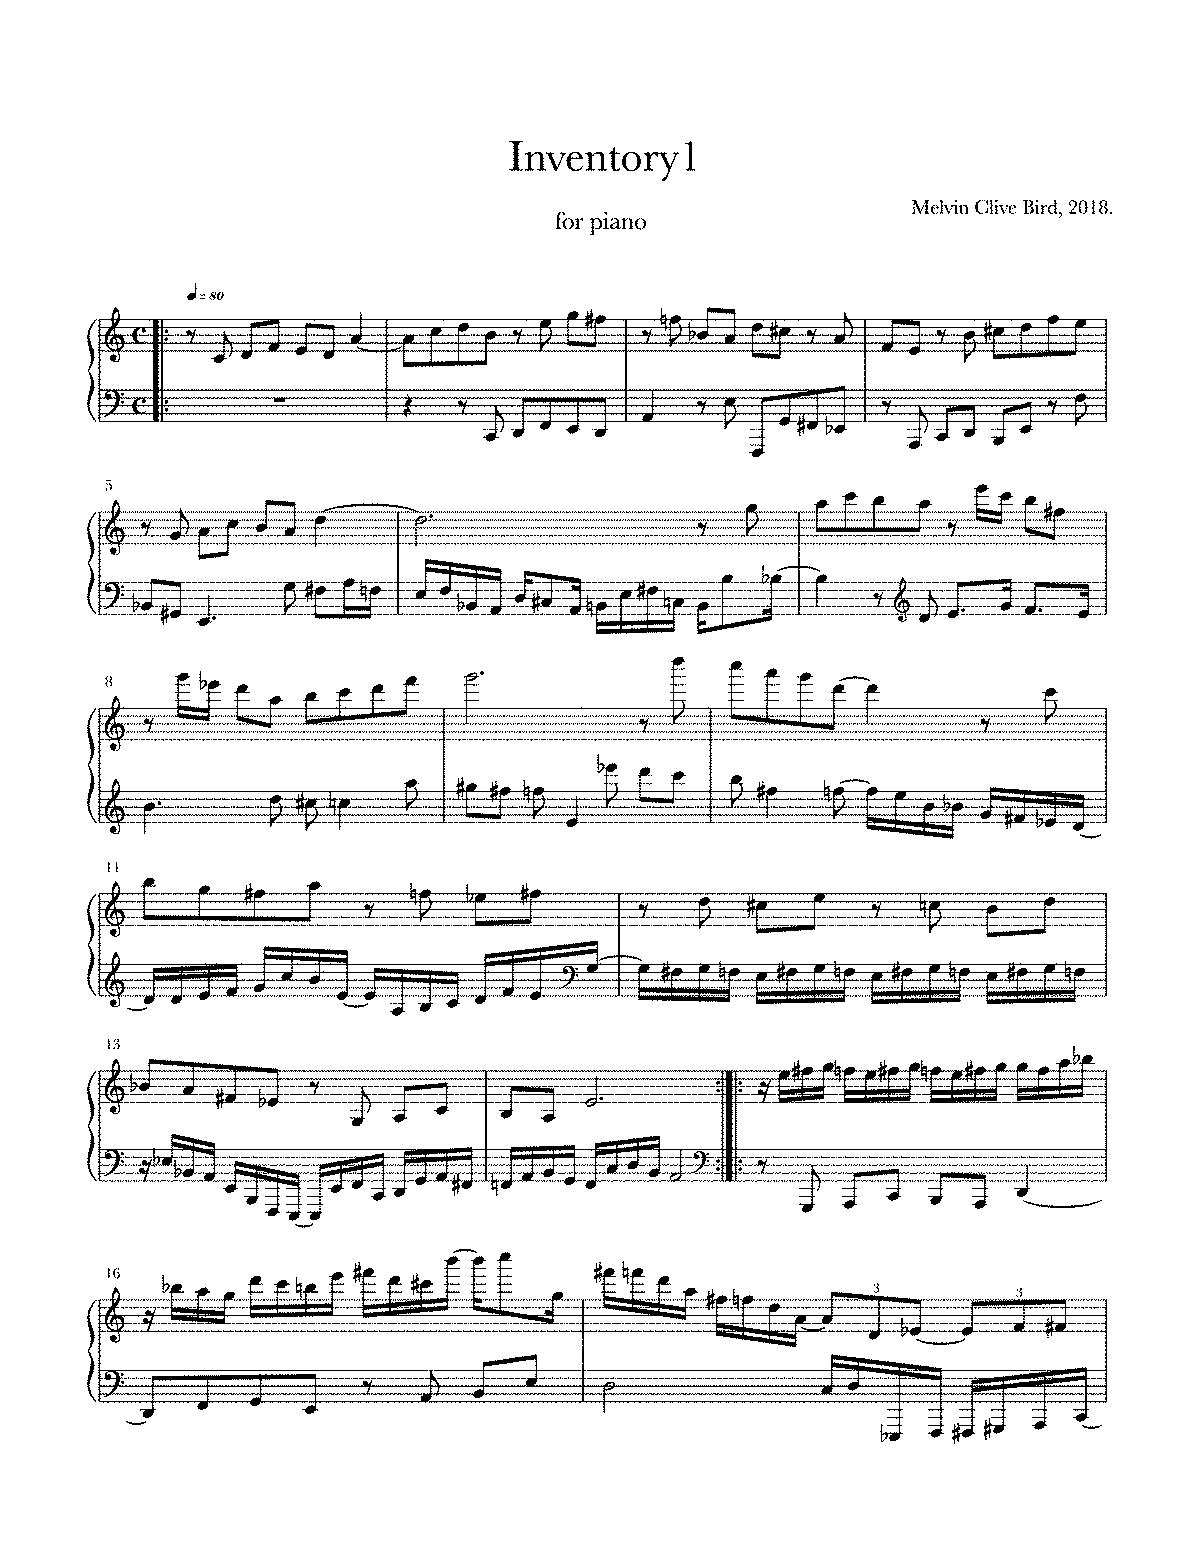 Inventory I (Bird, Melvin Clive) - IMSLP/Petrucci Music